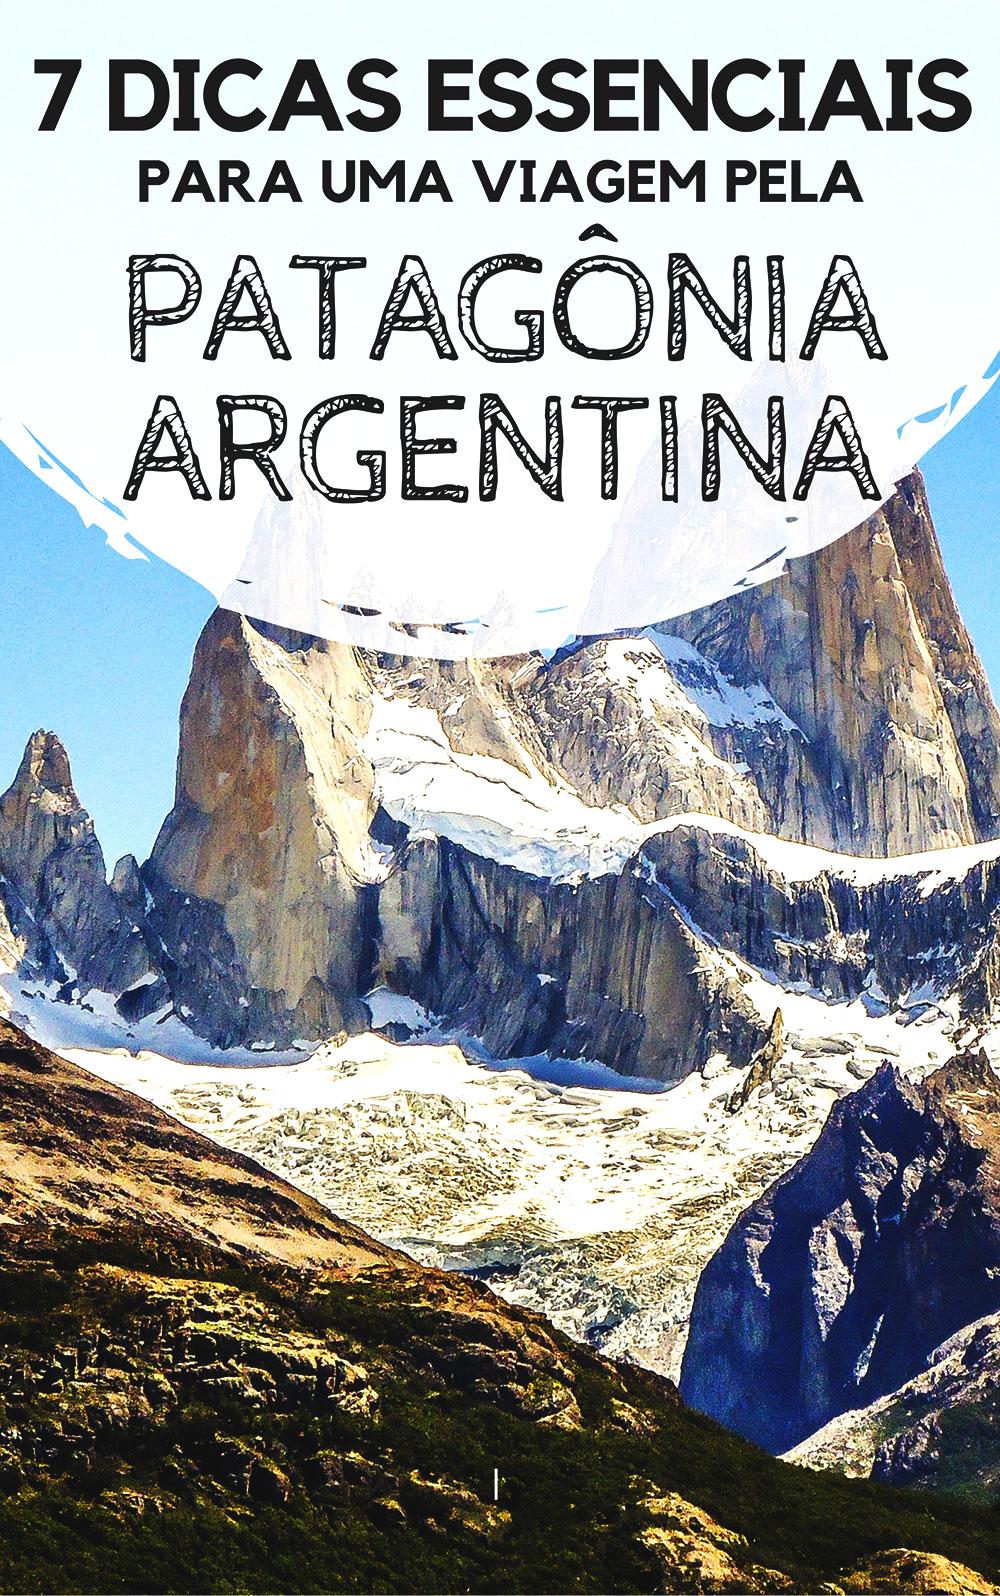 Patagonia  - Magazine cover